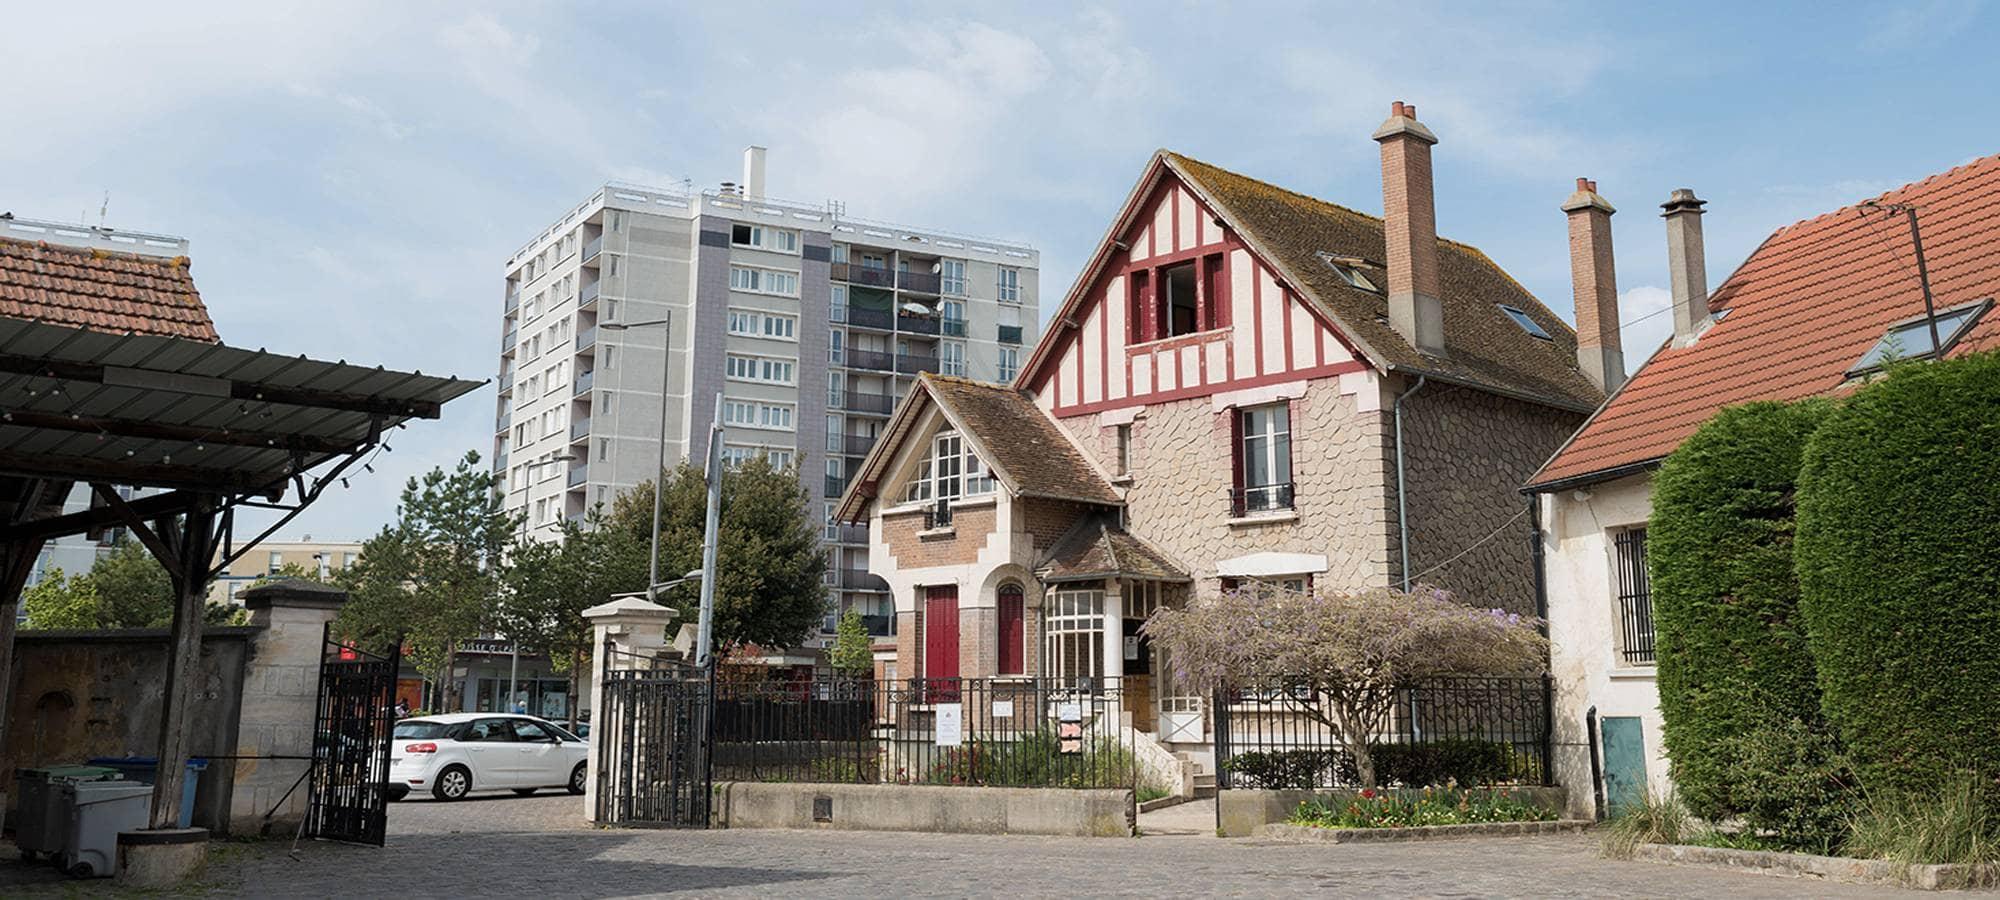 fenetres-Aulnay-sous-Bois